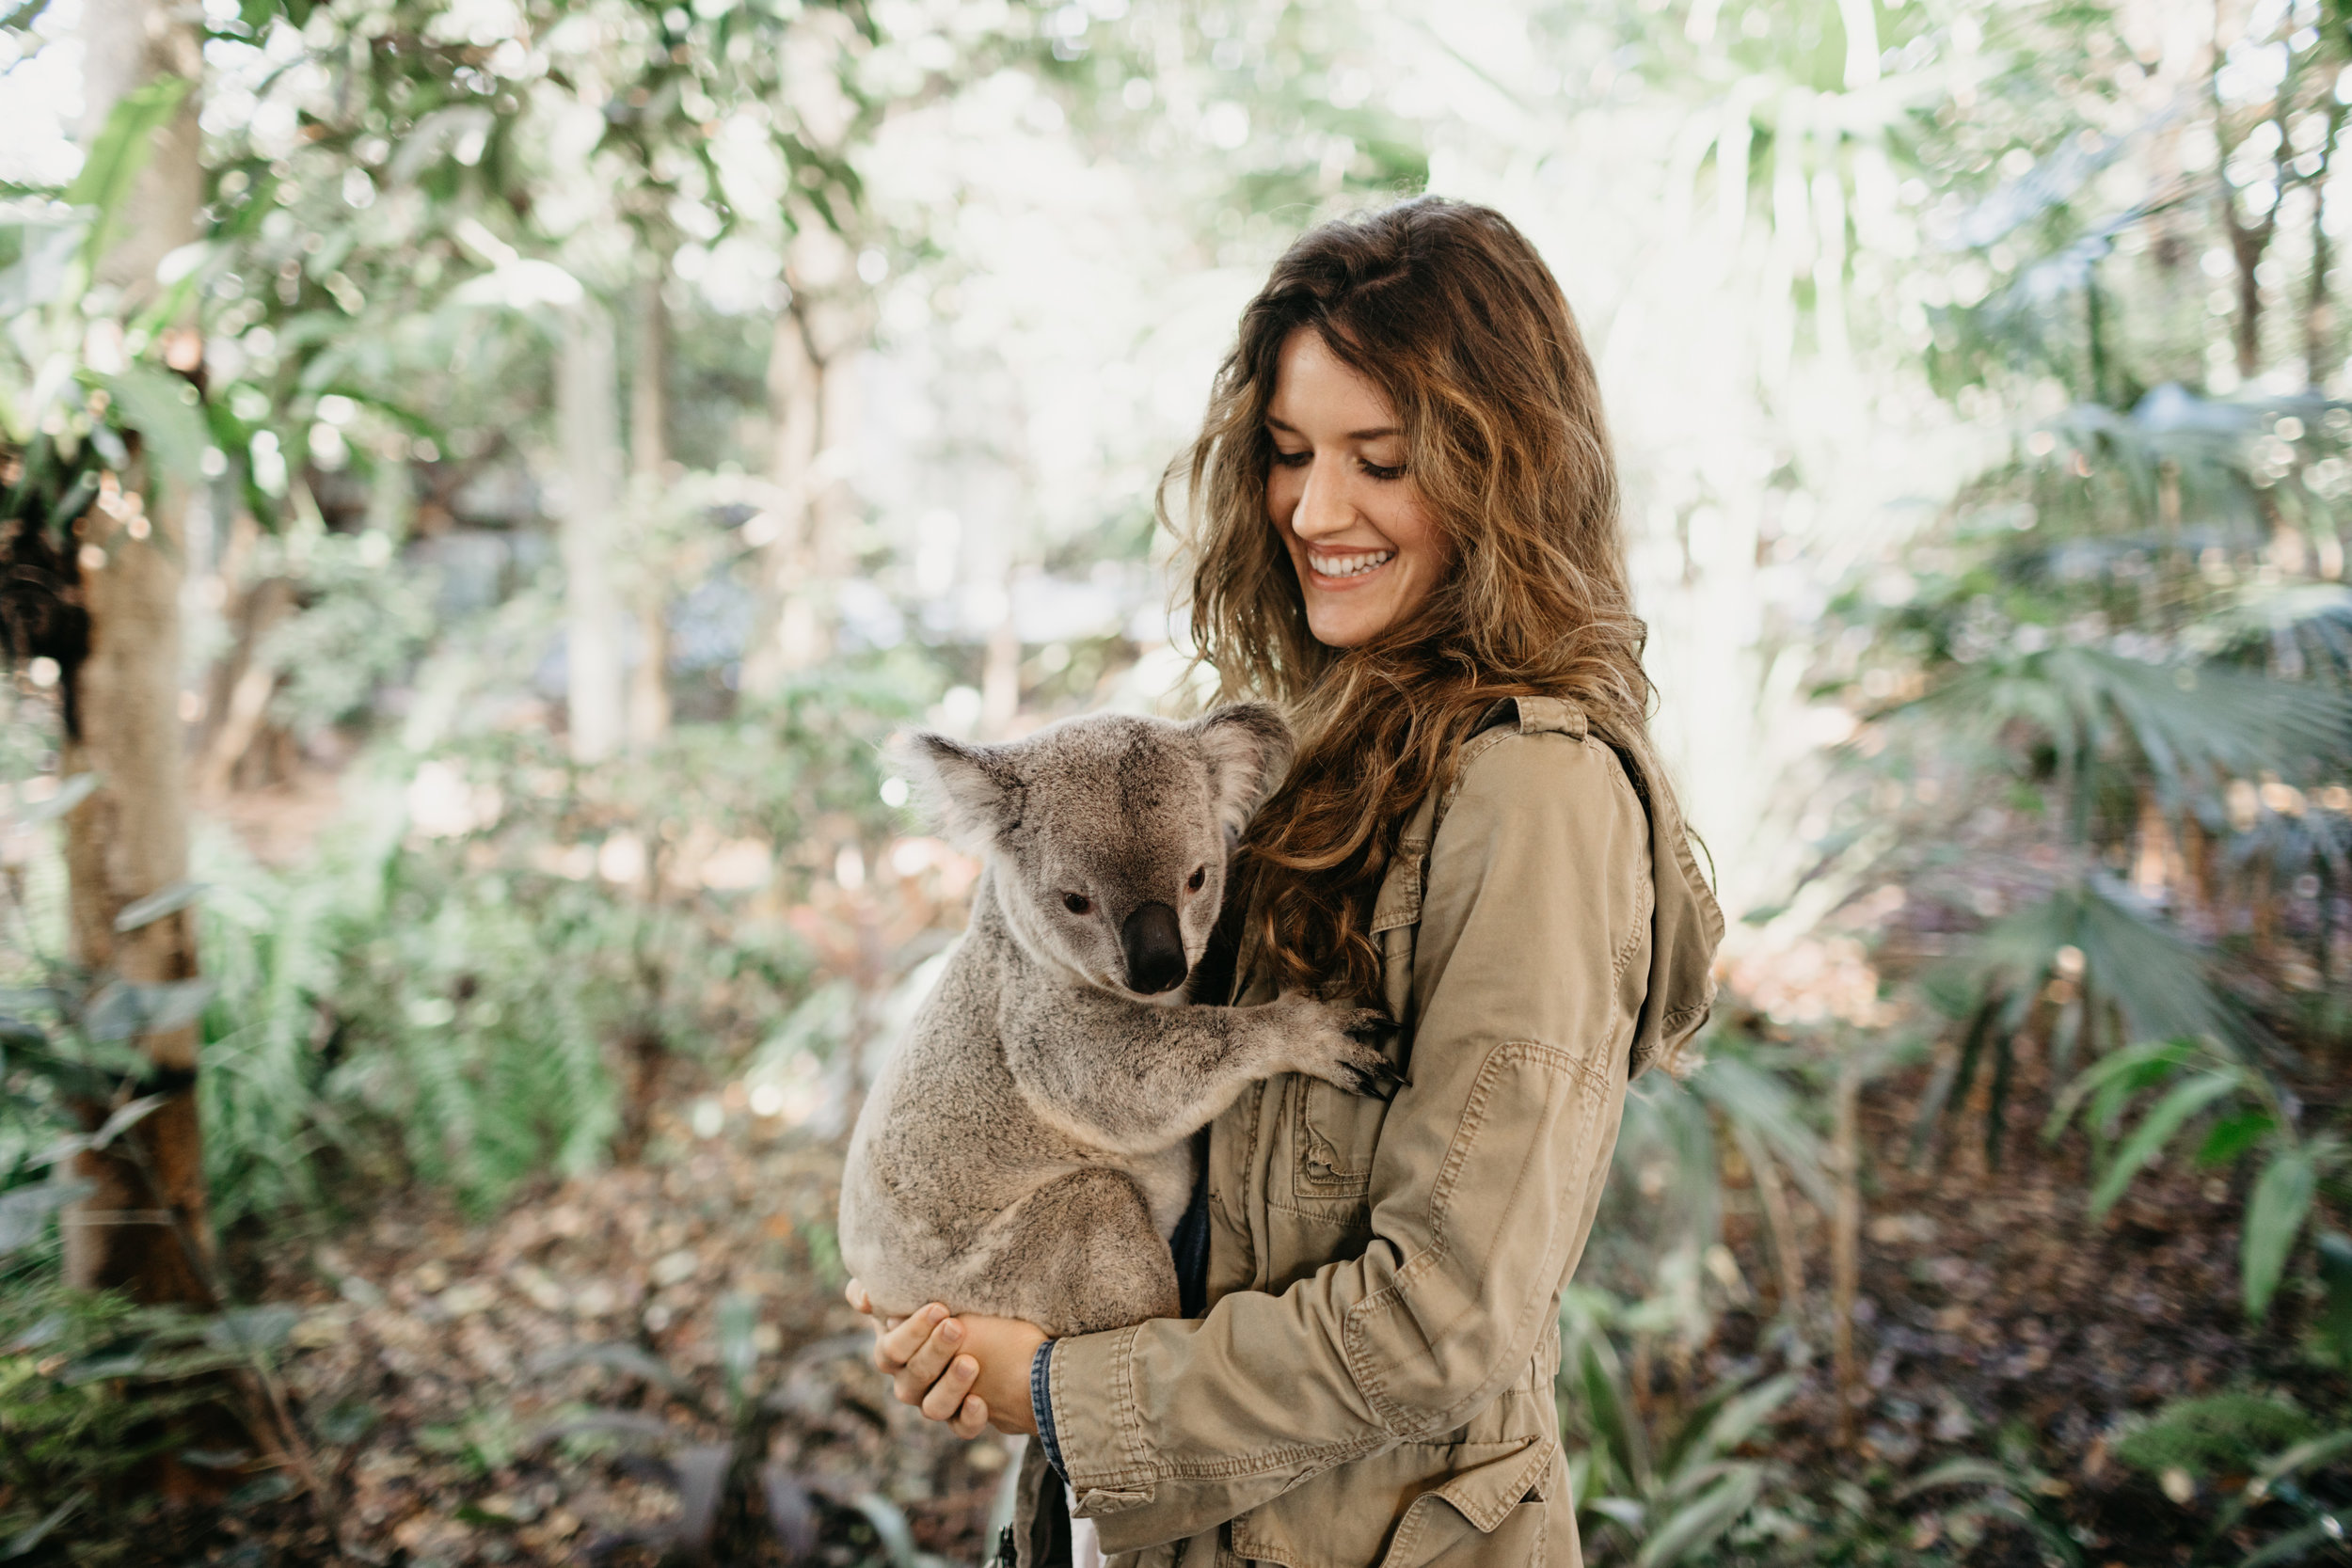 brisbane_lone_pine_koala_photo_by_samantha_look.jpg